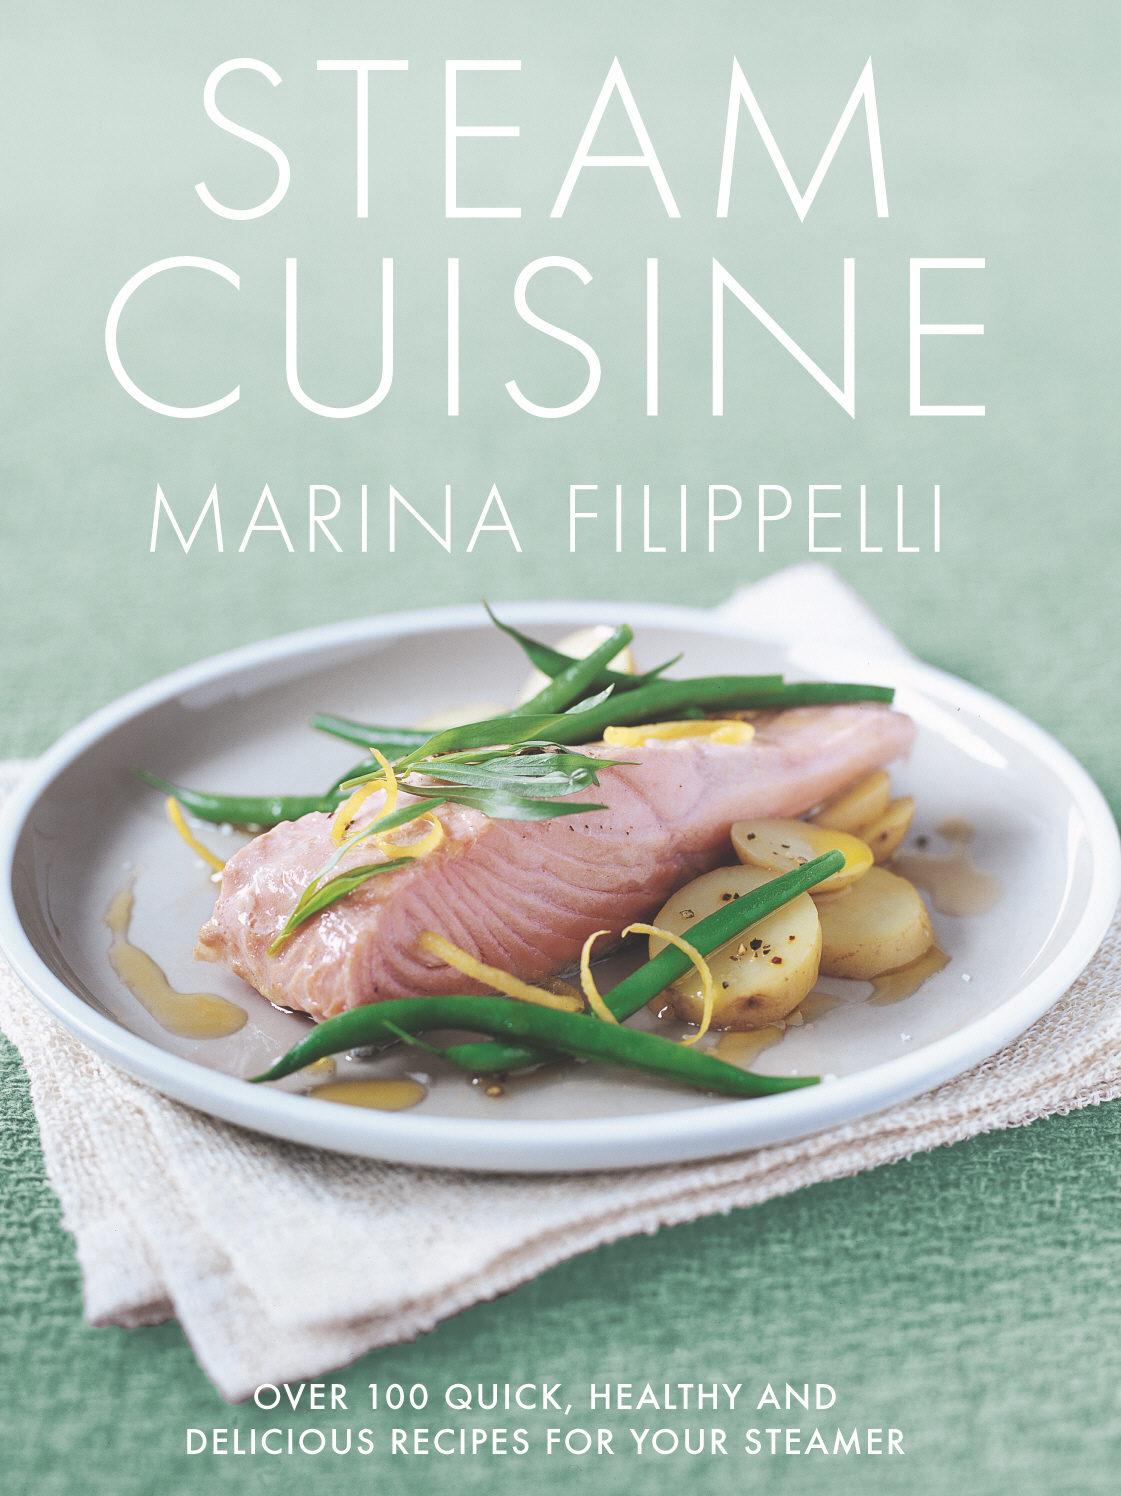 Steam cuisine ebook marina filippelli descargar libro pdf o epub steam cuisine ebook marina filippelli 9781448177912 forumfinder Gallery